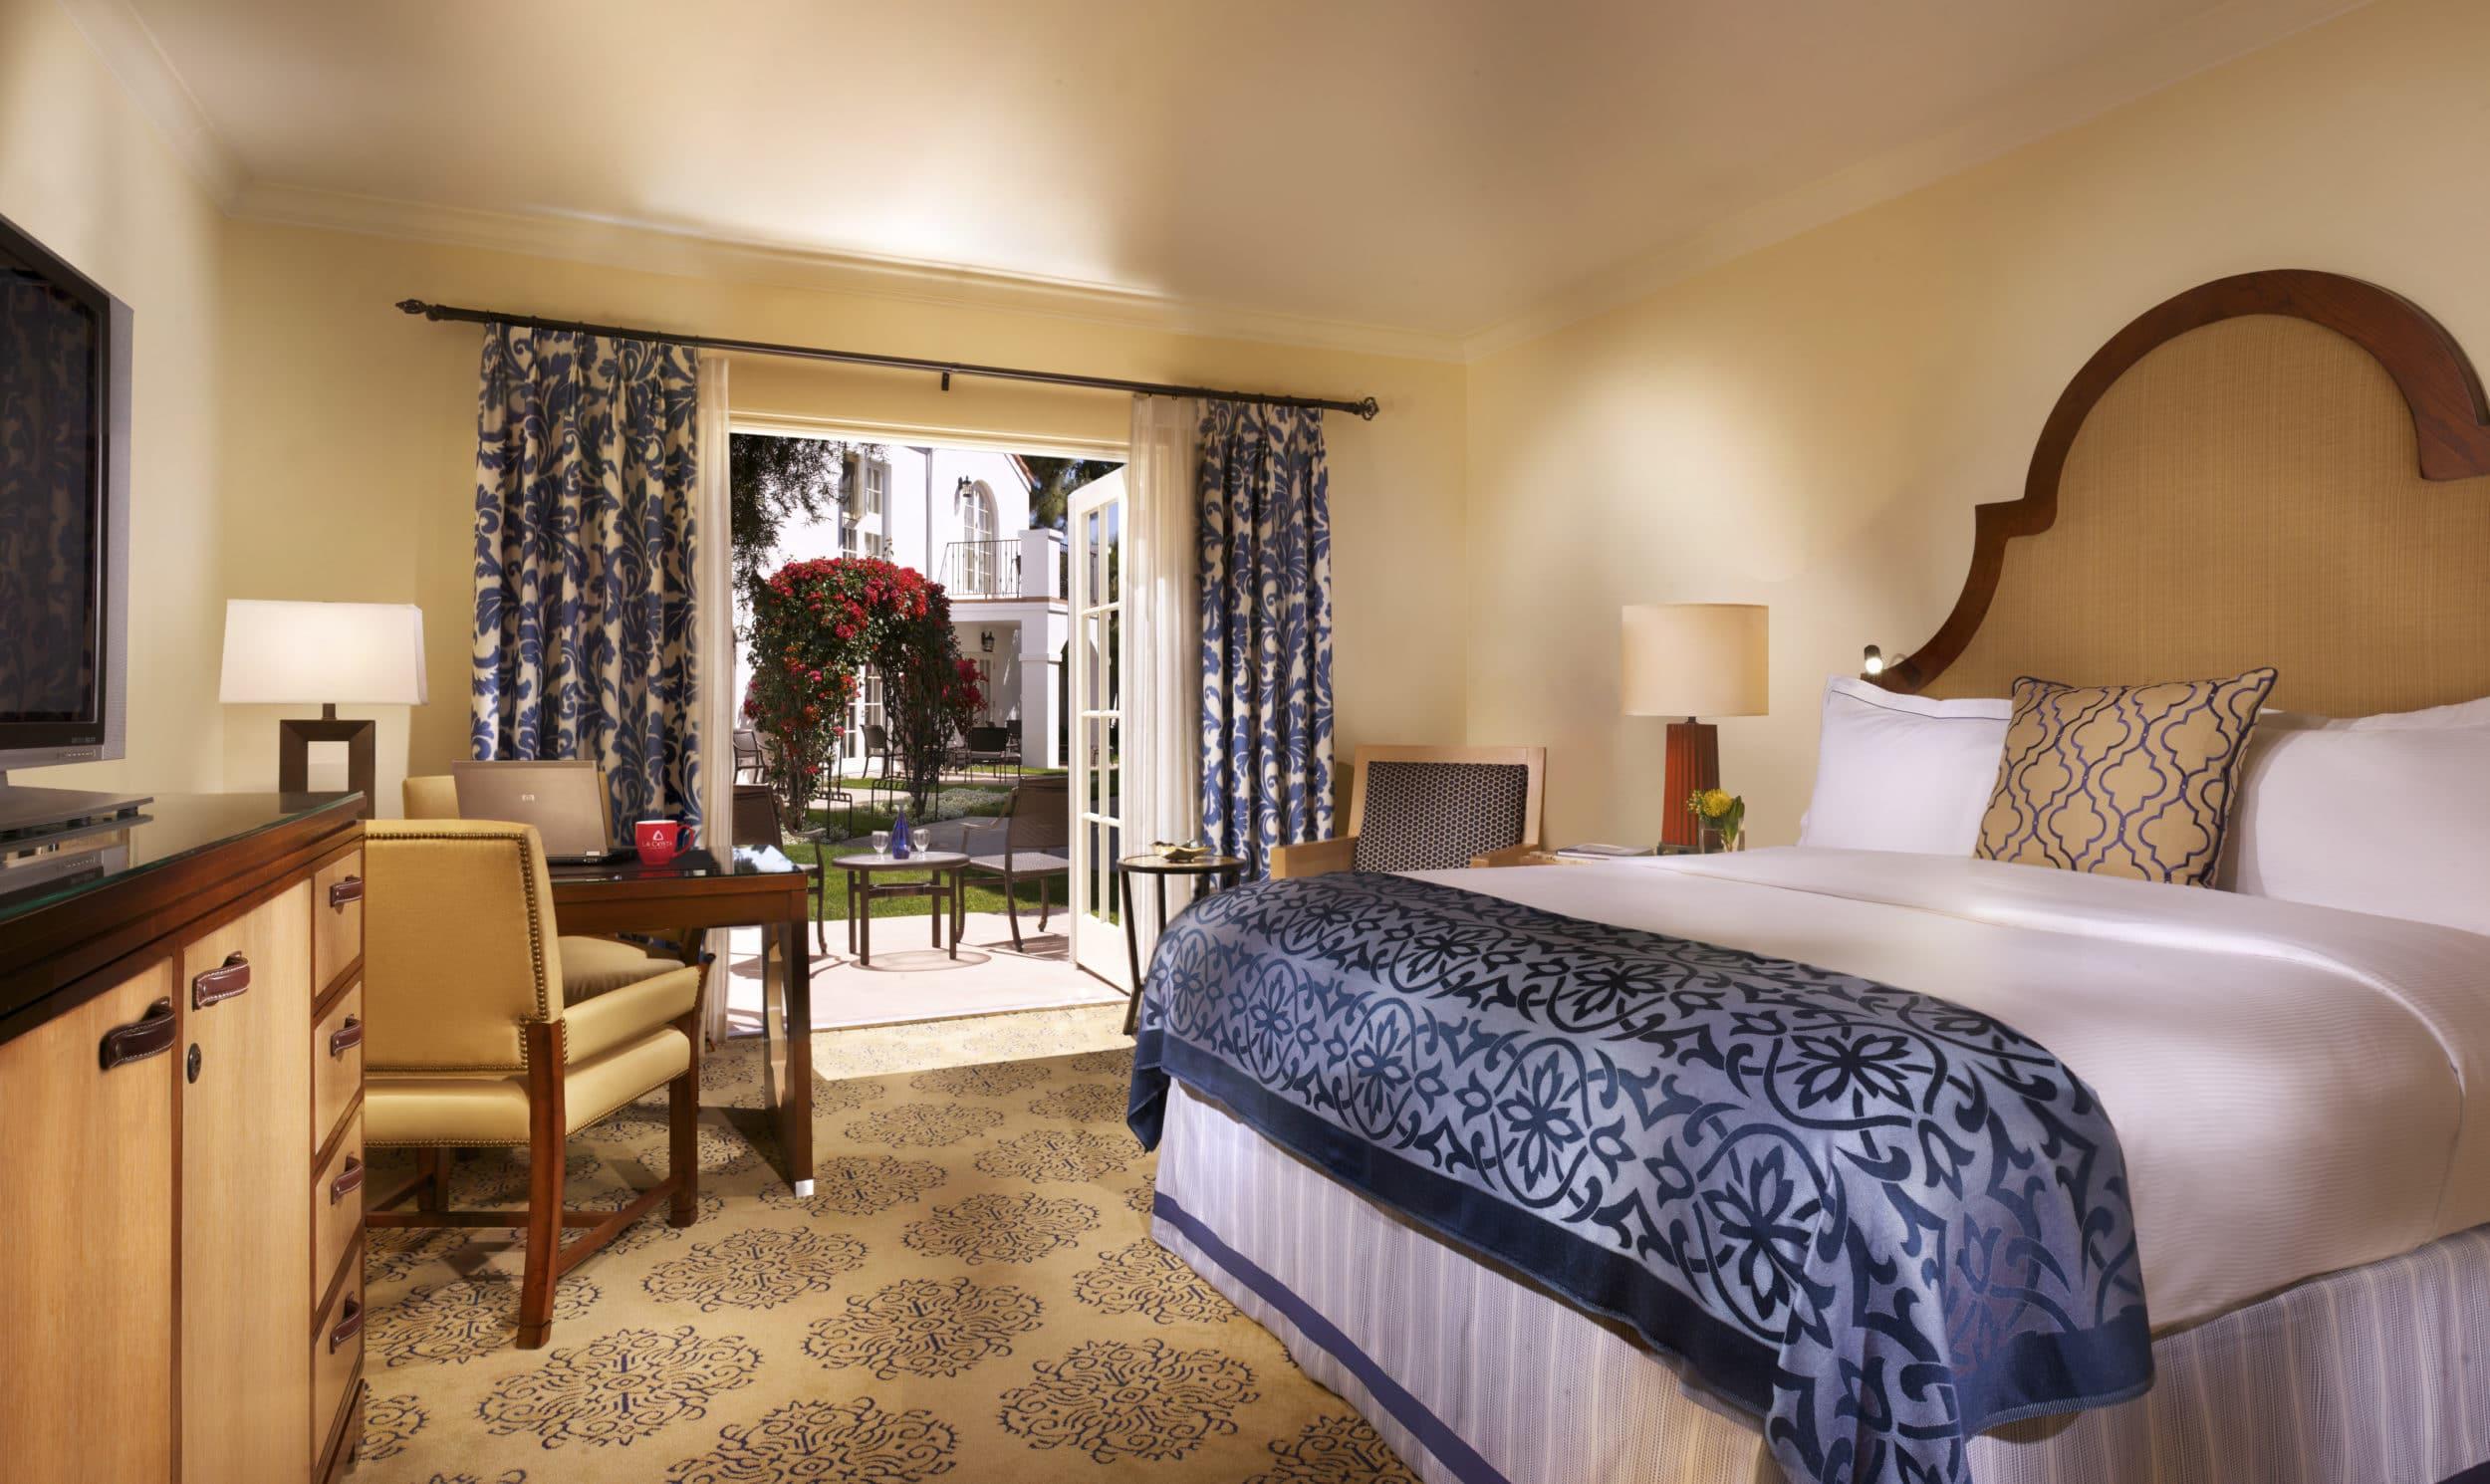 A Signature Room at Omni La Costa Resort and Spa